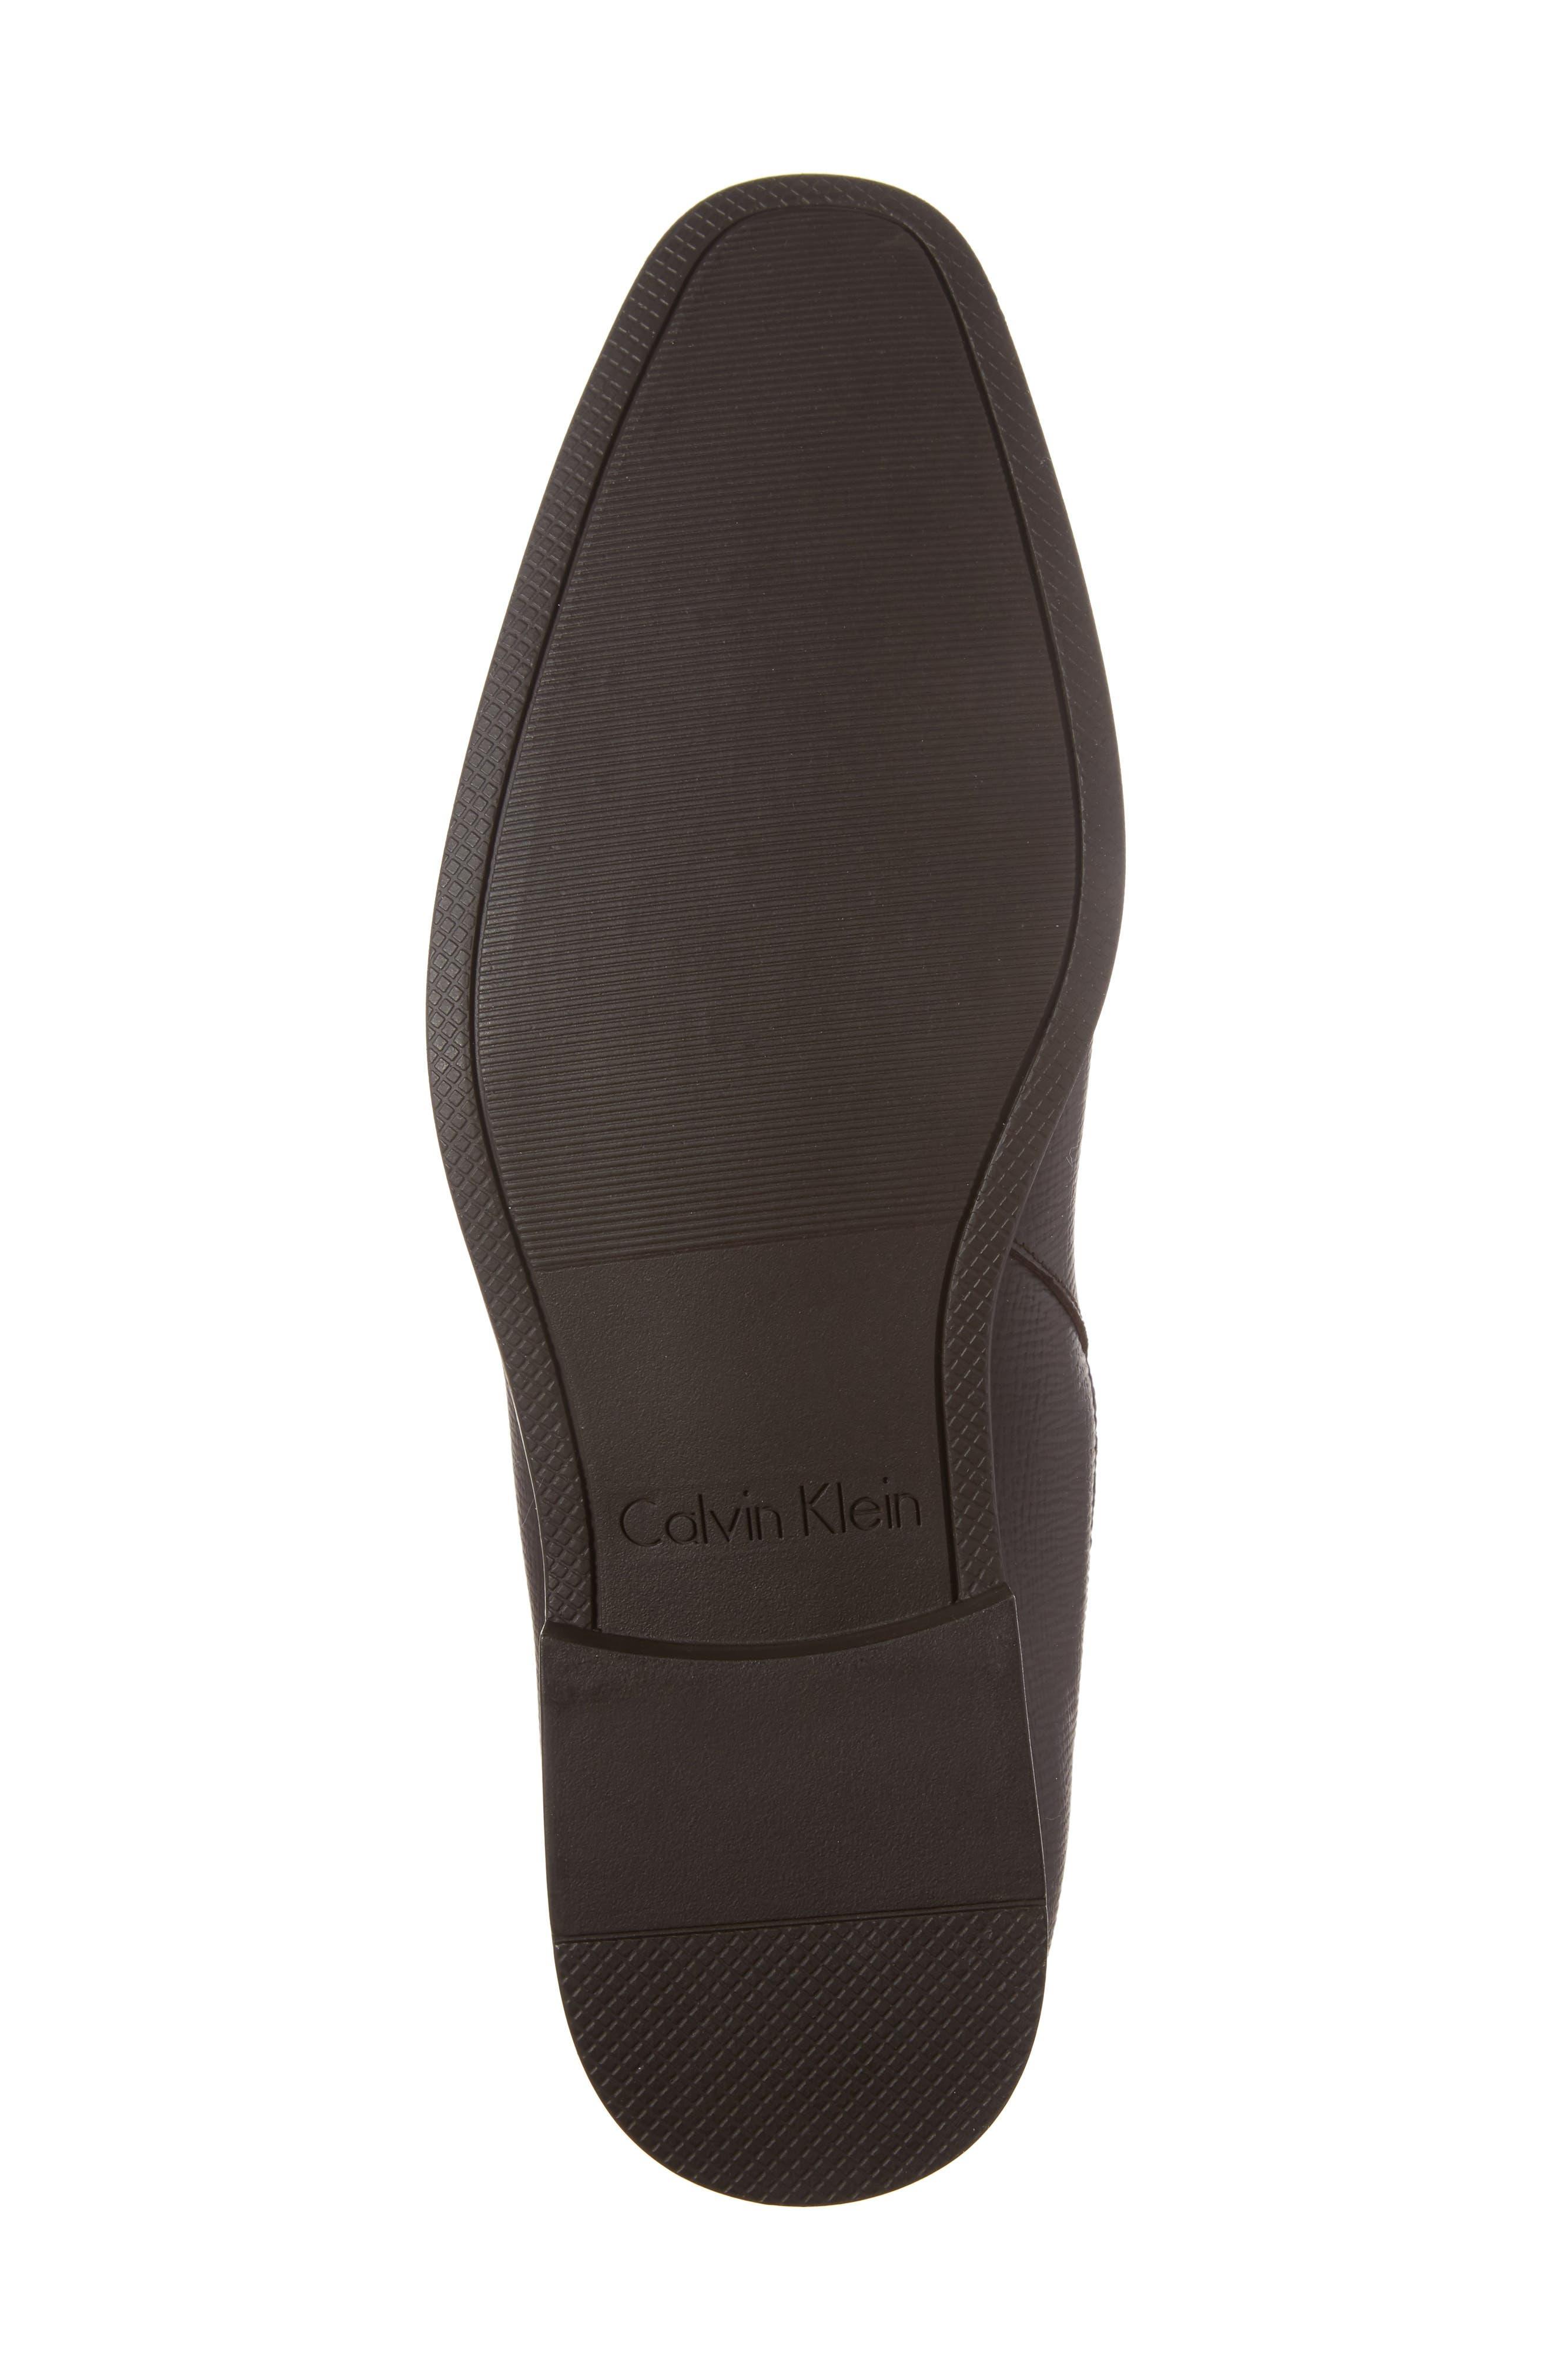 Christoff Chelsea Boot,                             Alternate thumbnail 6, color,                             Dark Brown Epi Leather